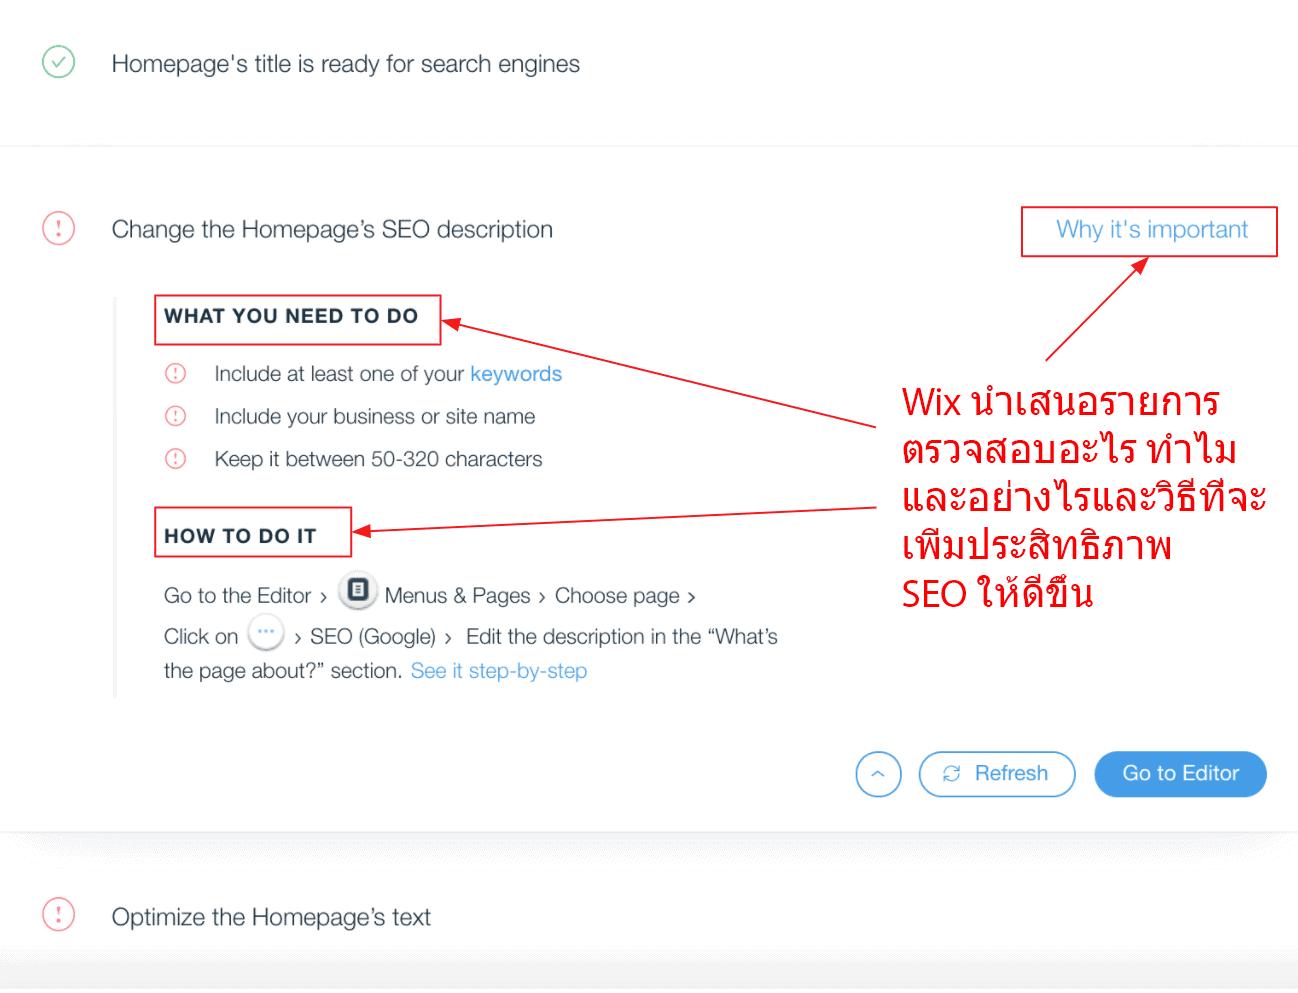 Wix SEO Wiz checklist_thai